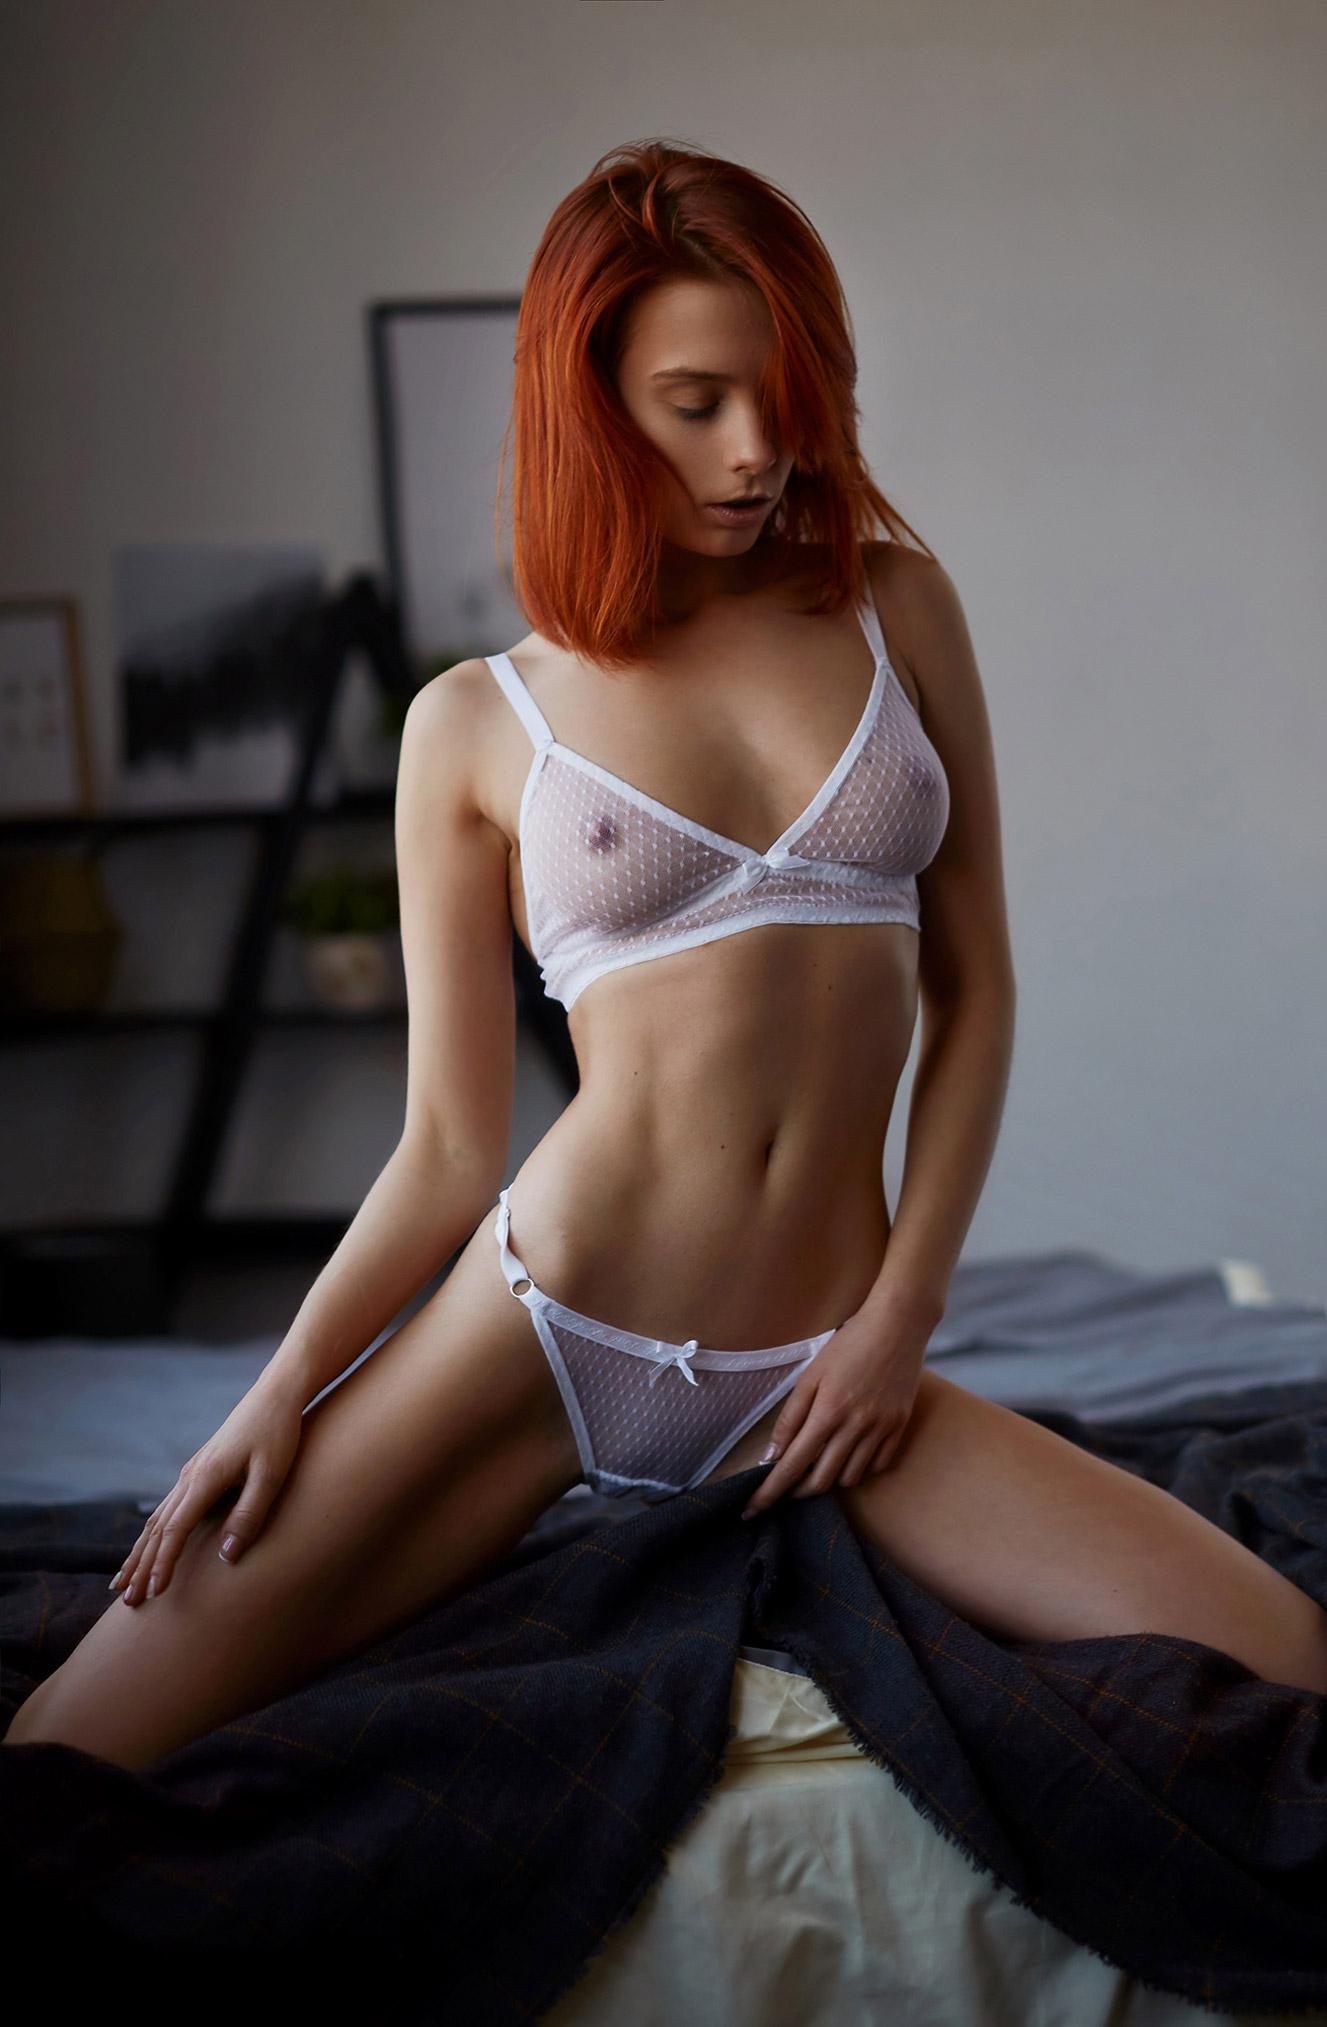 Марта Громова, фотограф Дмитрий Лобанов / фото 02